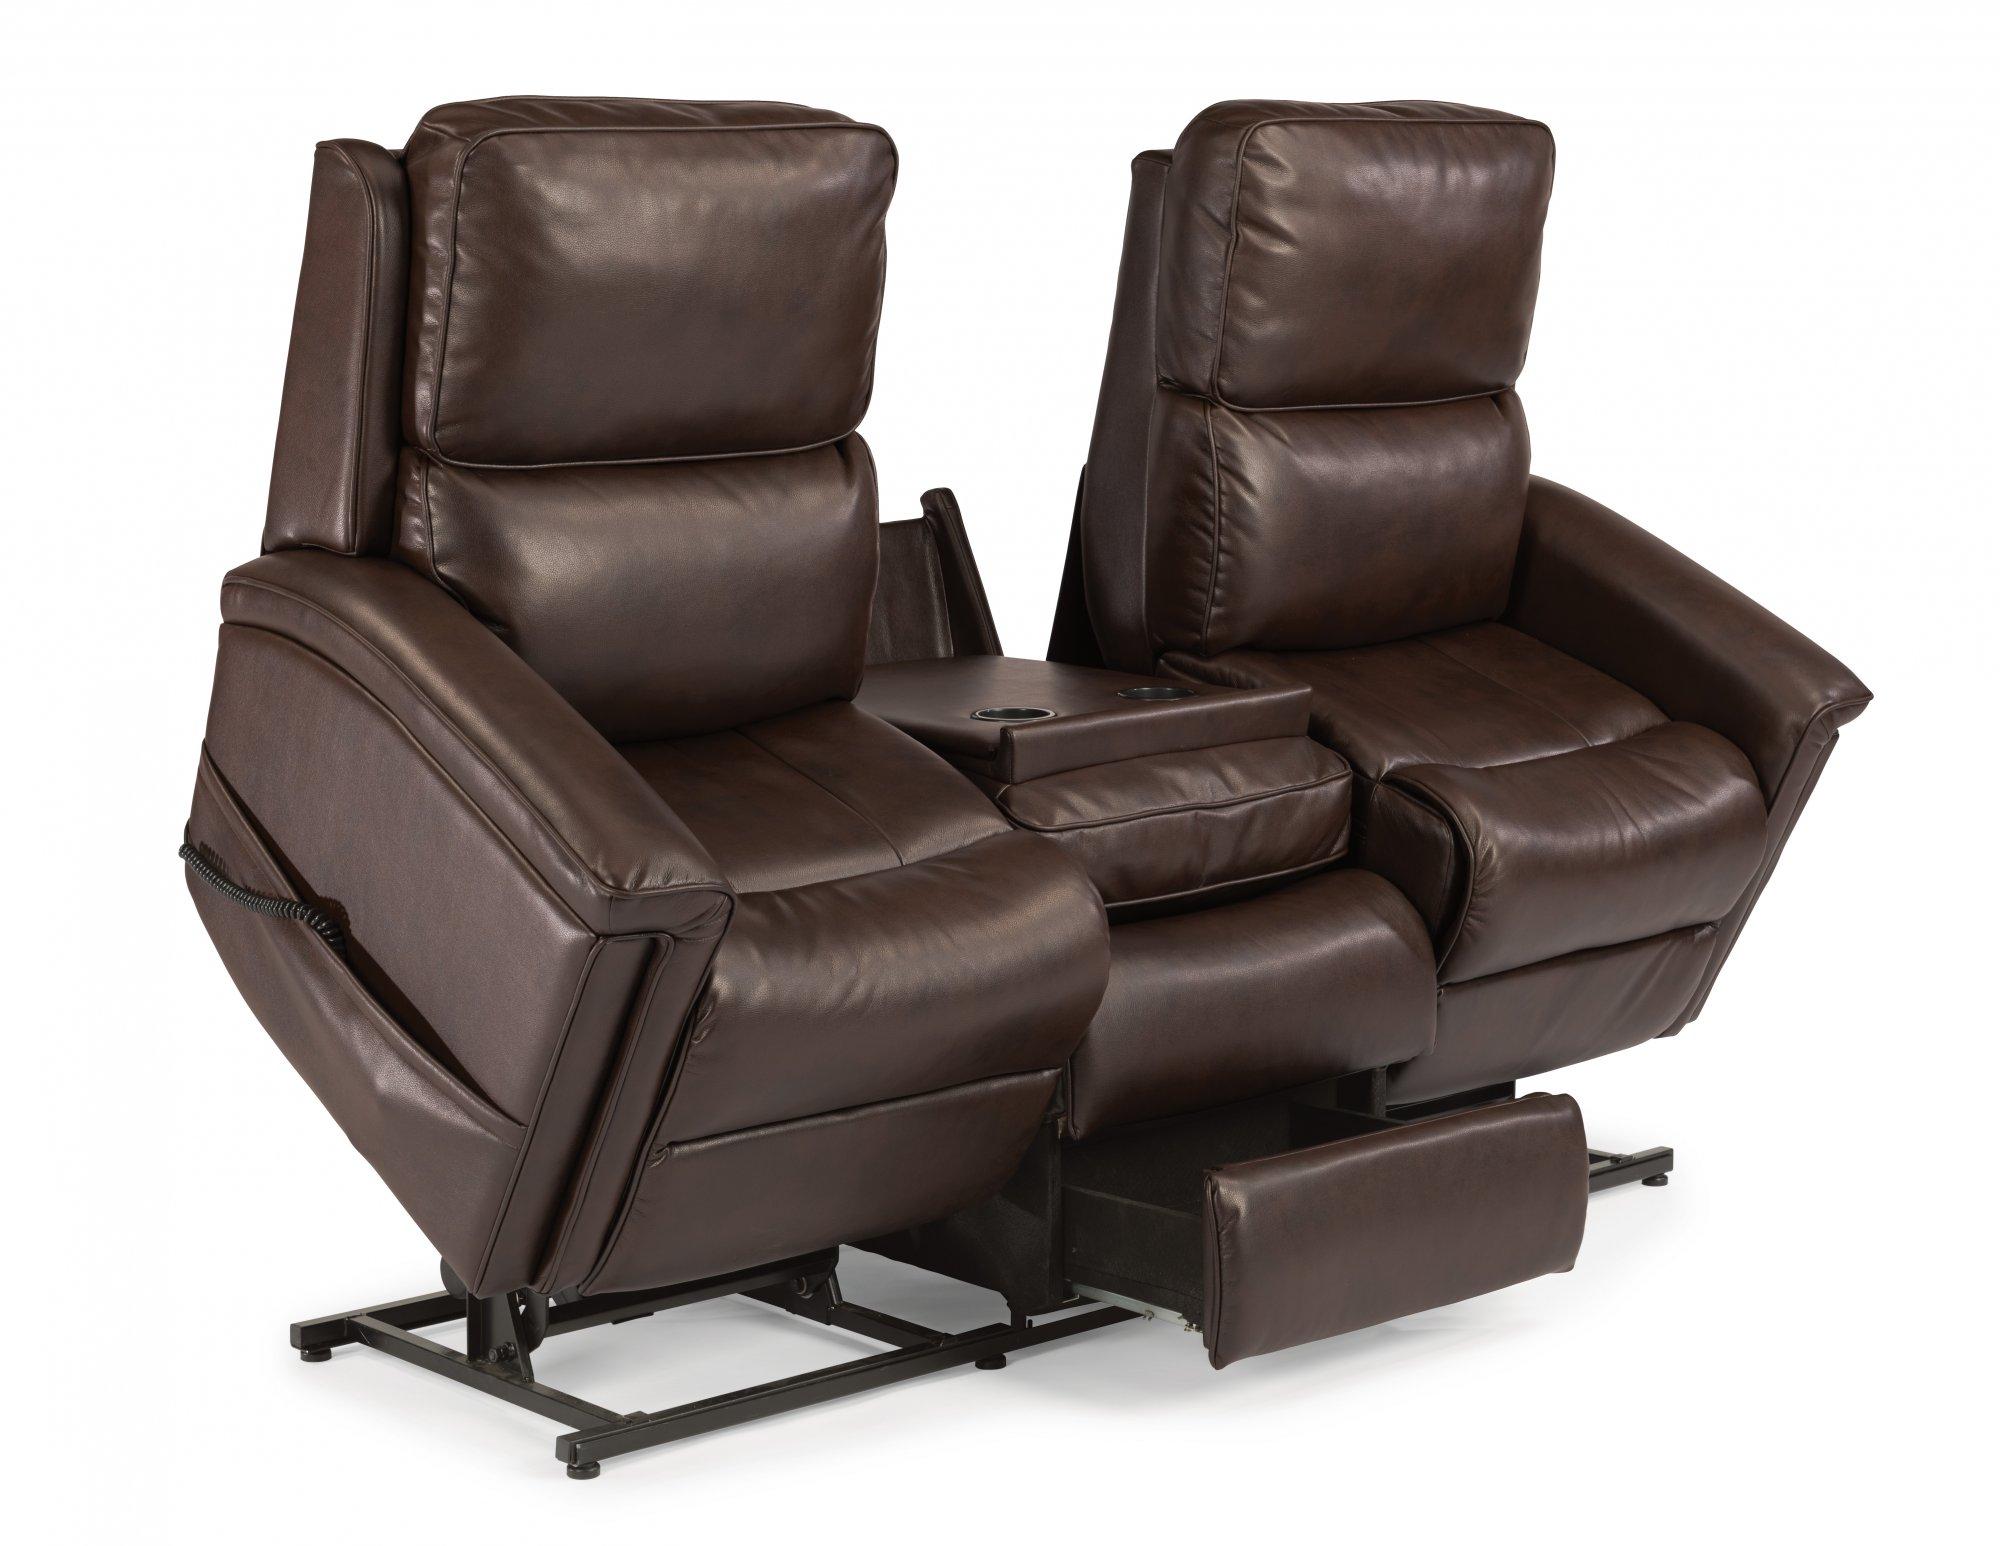 Marvelous Flexsteel 1906 625 Samantha Fabric Lift Reclining Sofa Forskolin Free Trial Chair Design Images Forskolin Free Trialorg